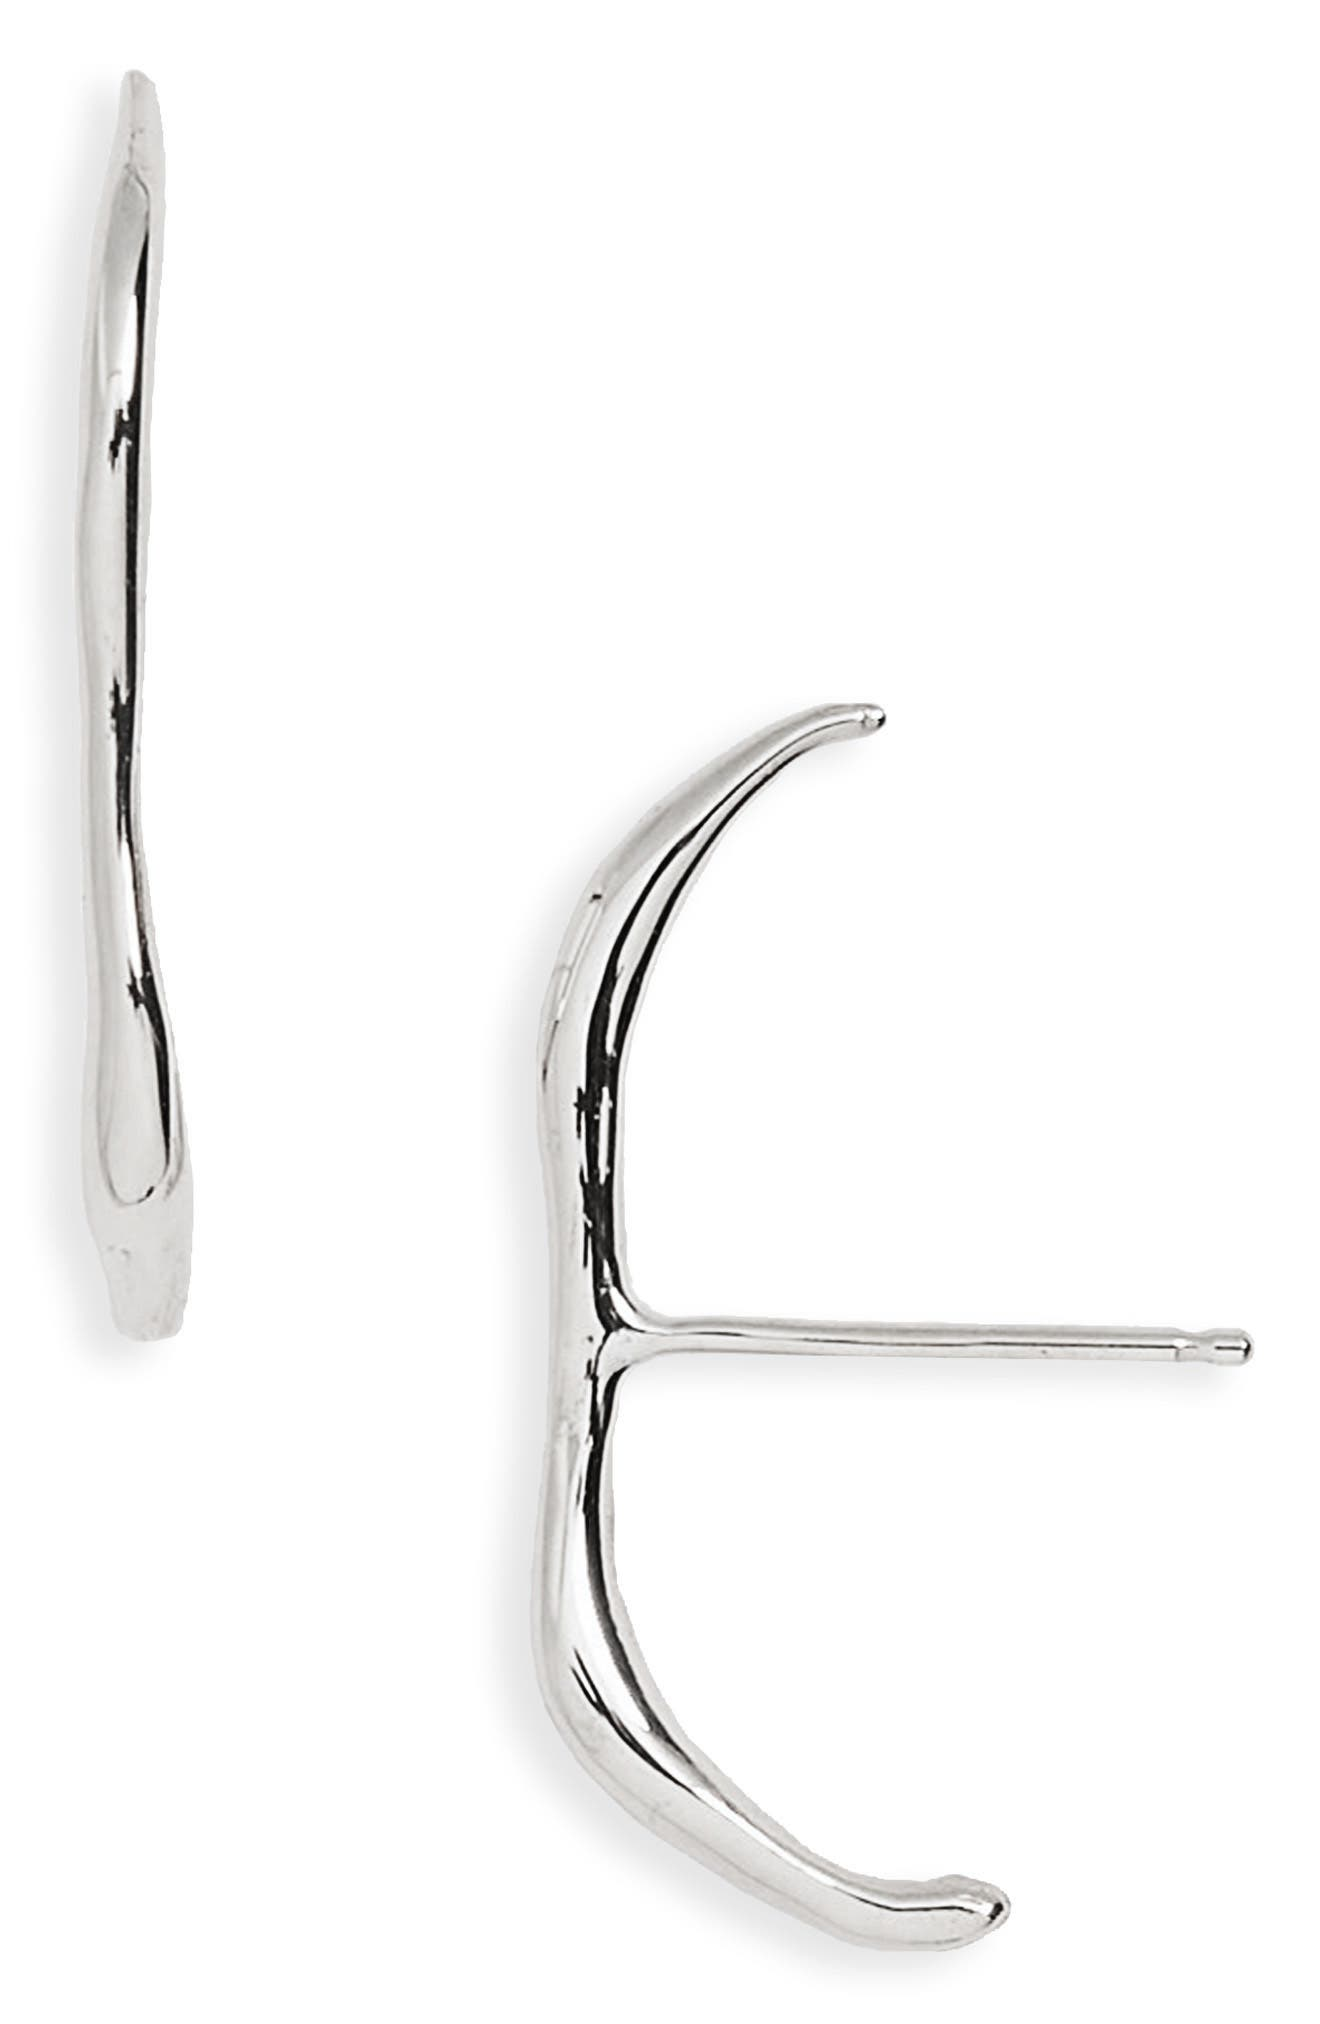 Vero Stud Earrings,                             Main thumbnail 1, color,                             STERLING SILVER